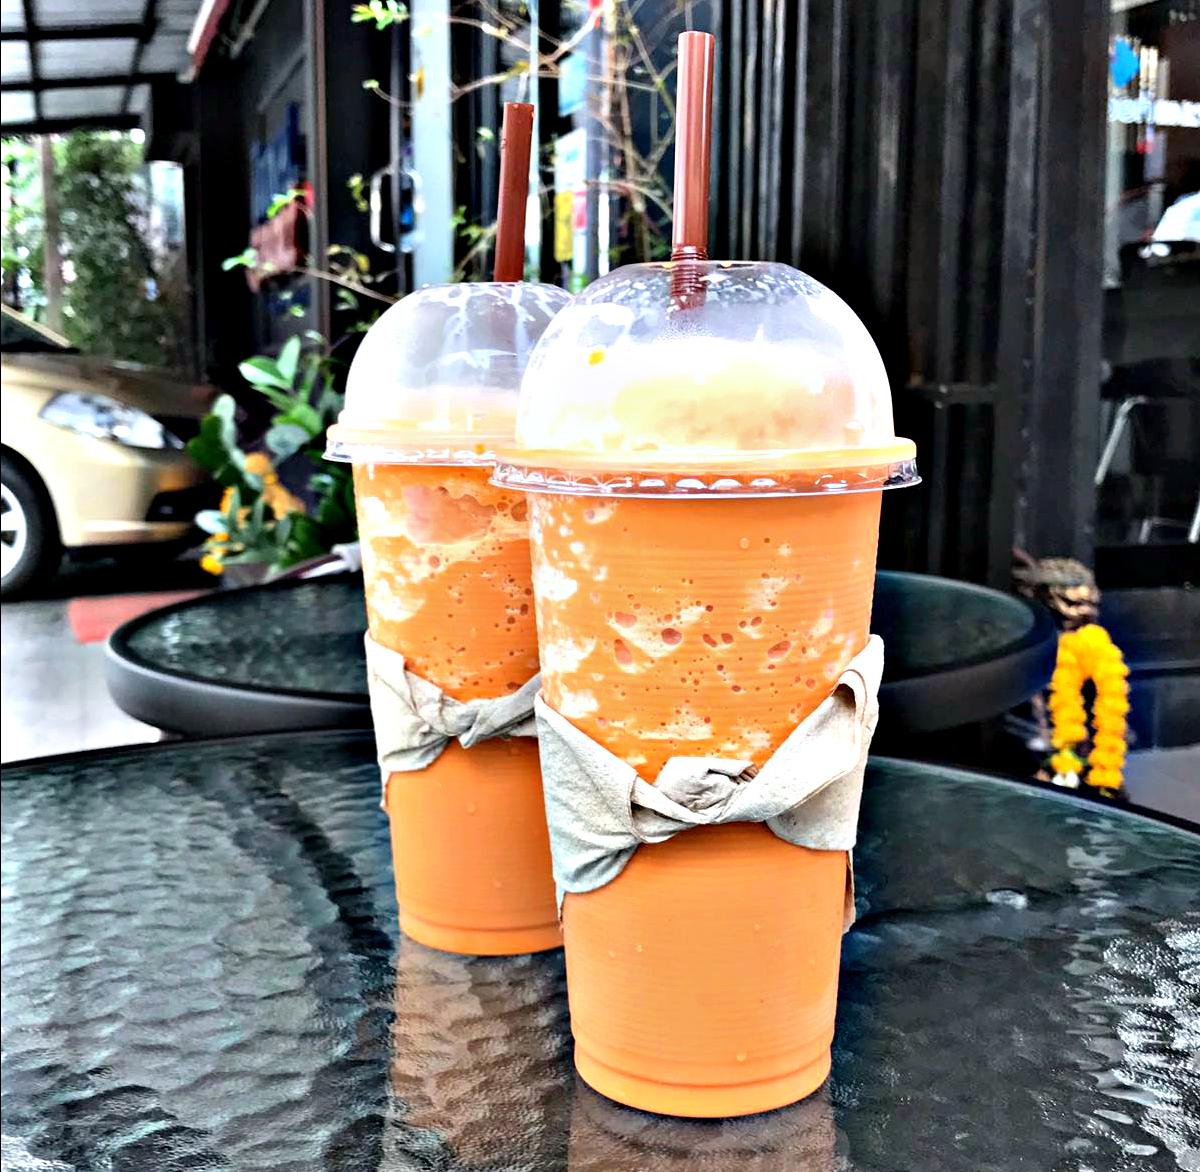 Wait… what makes Thai Iced Tea that orange color?